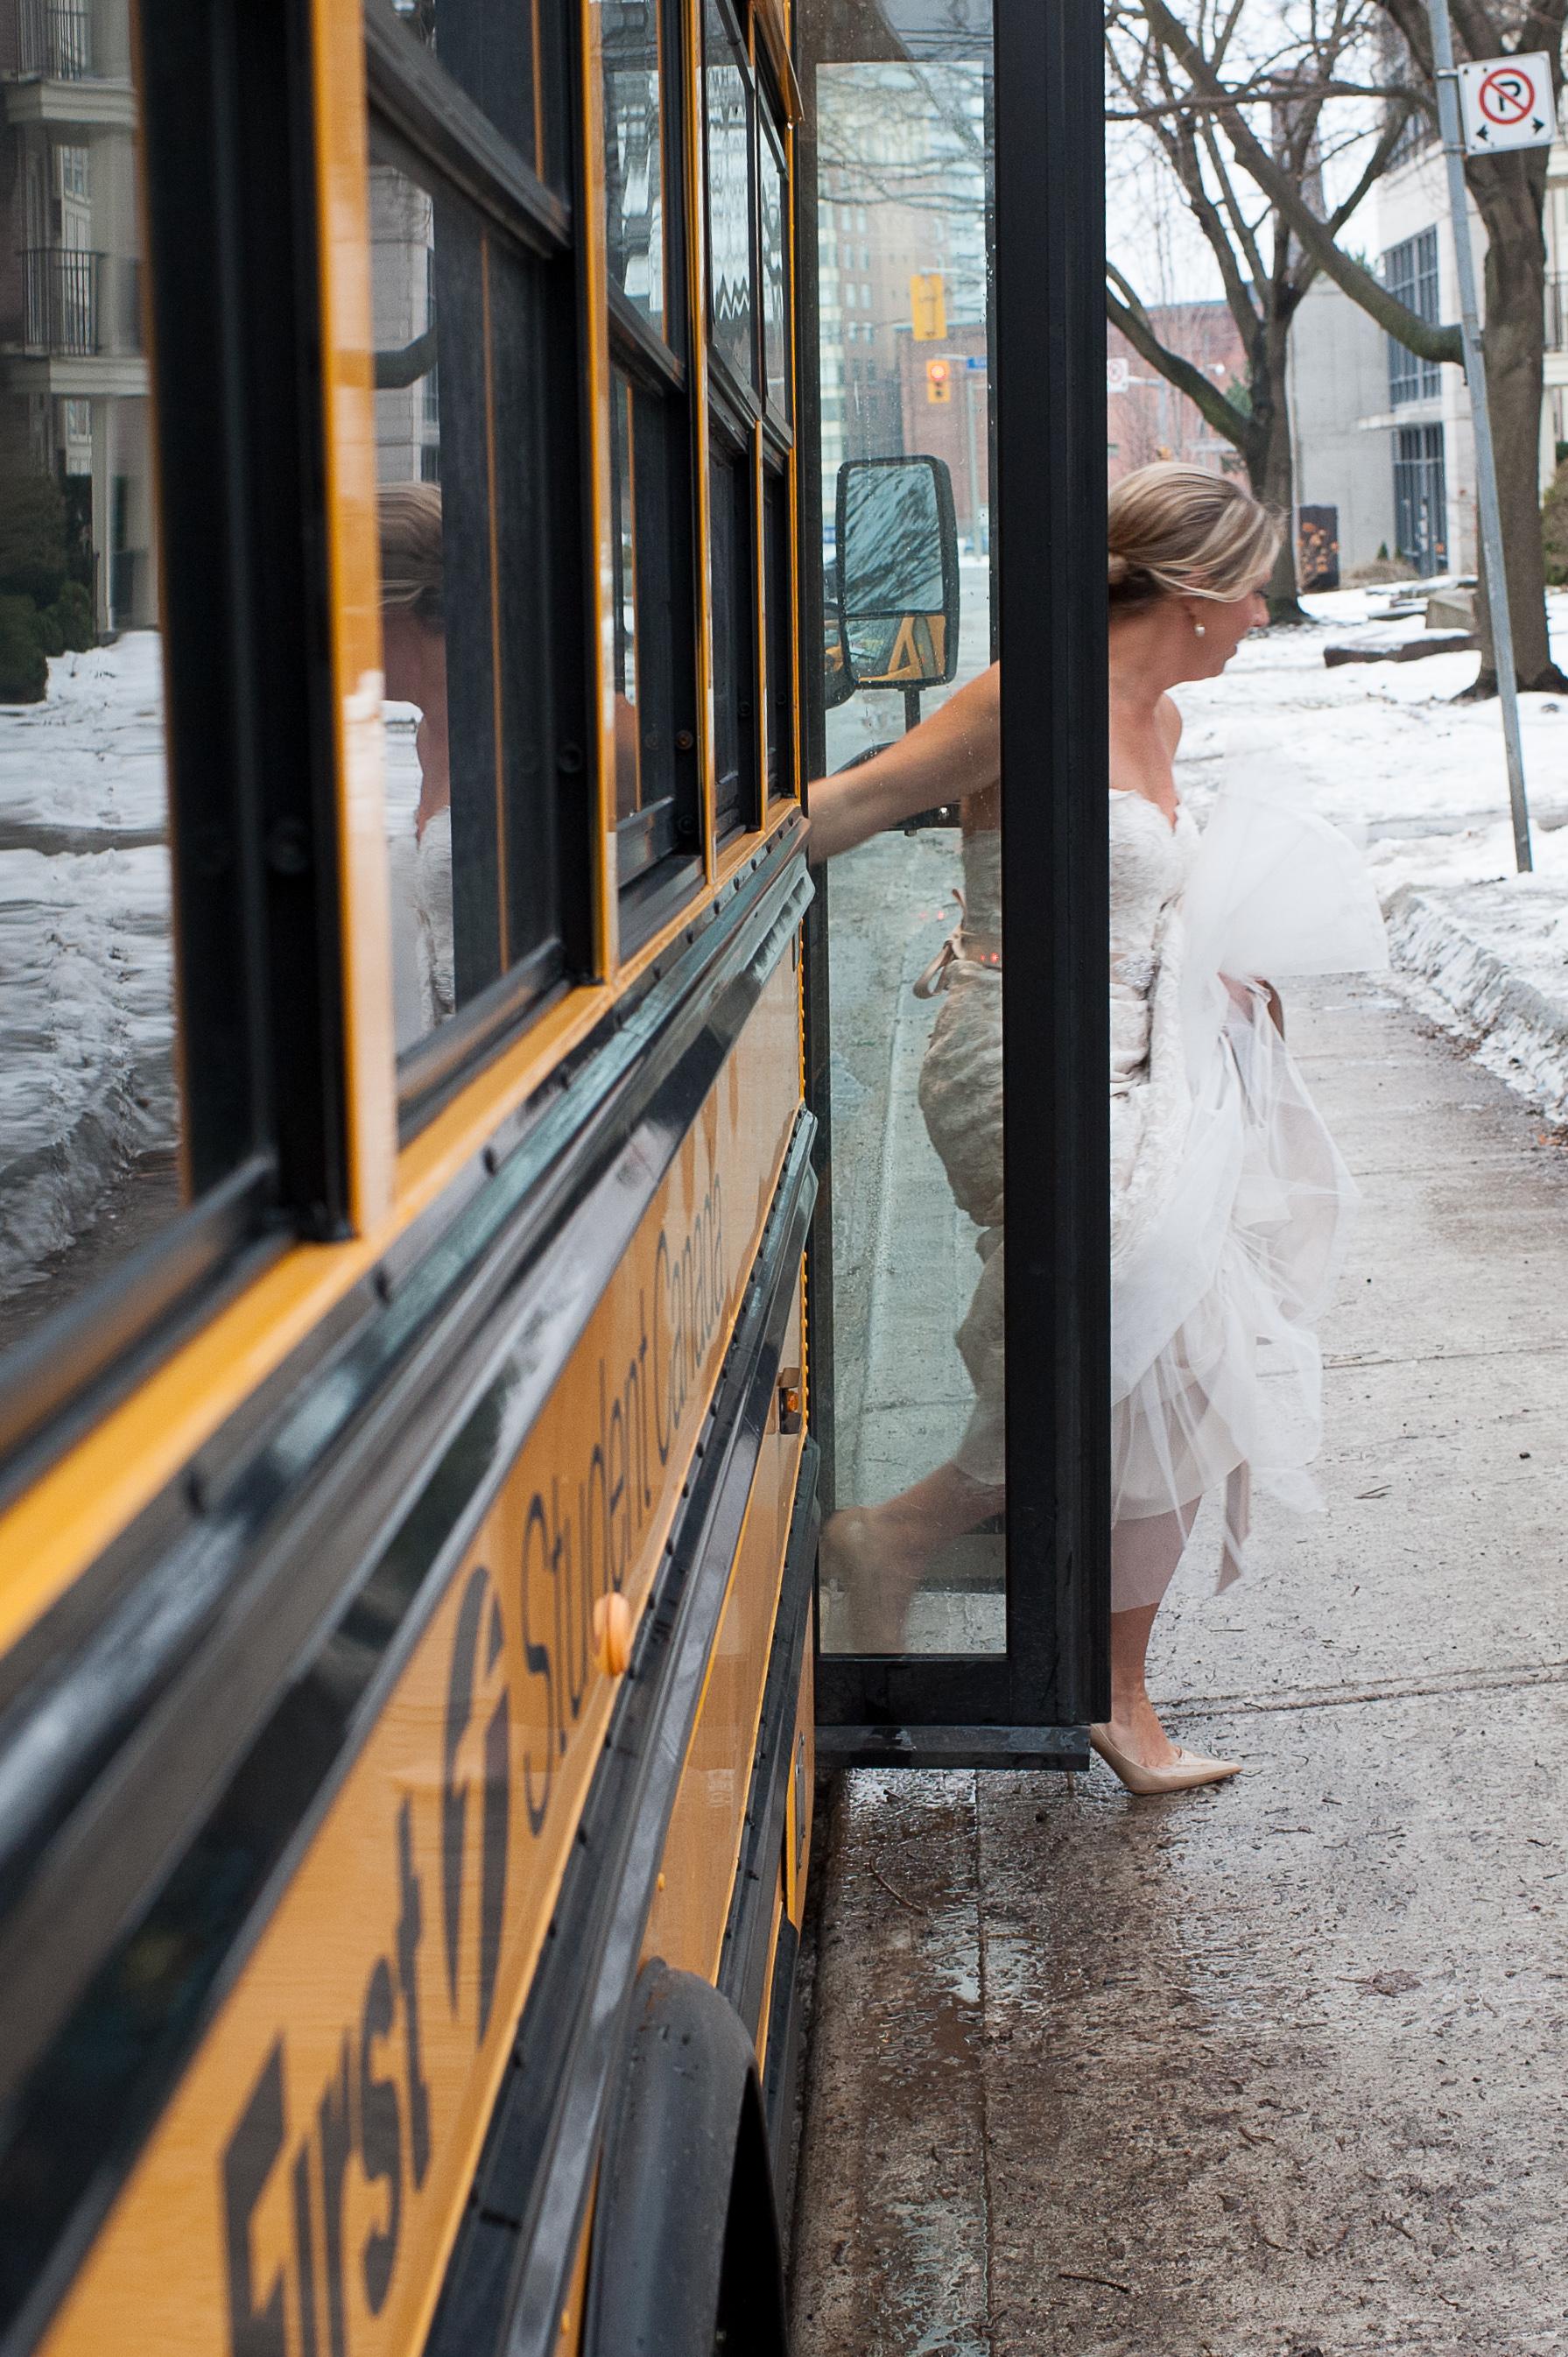 enoch-turner-wedding-photograph-002.jpg